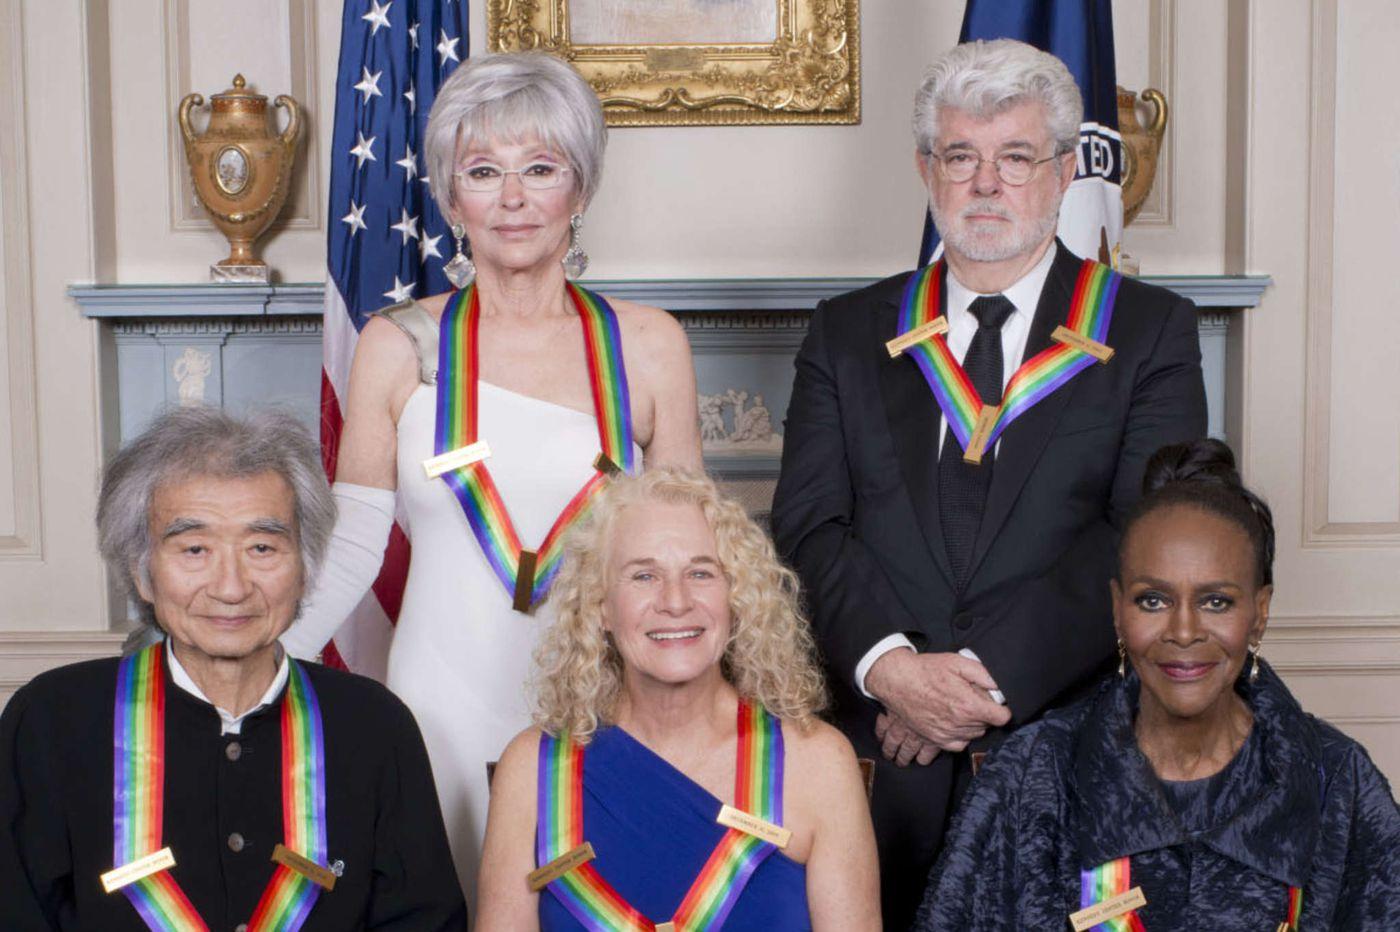 Kennedy Center Honors show on CBS: Duty-bound, but still needing a jolt